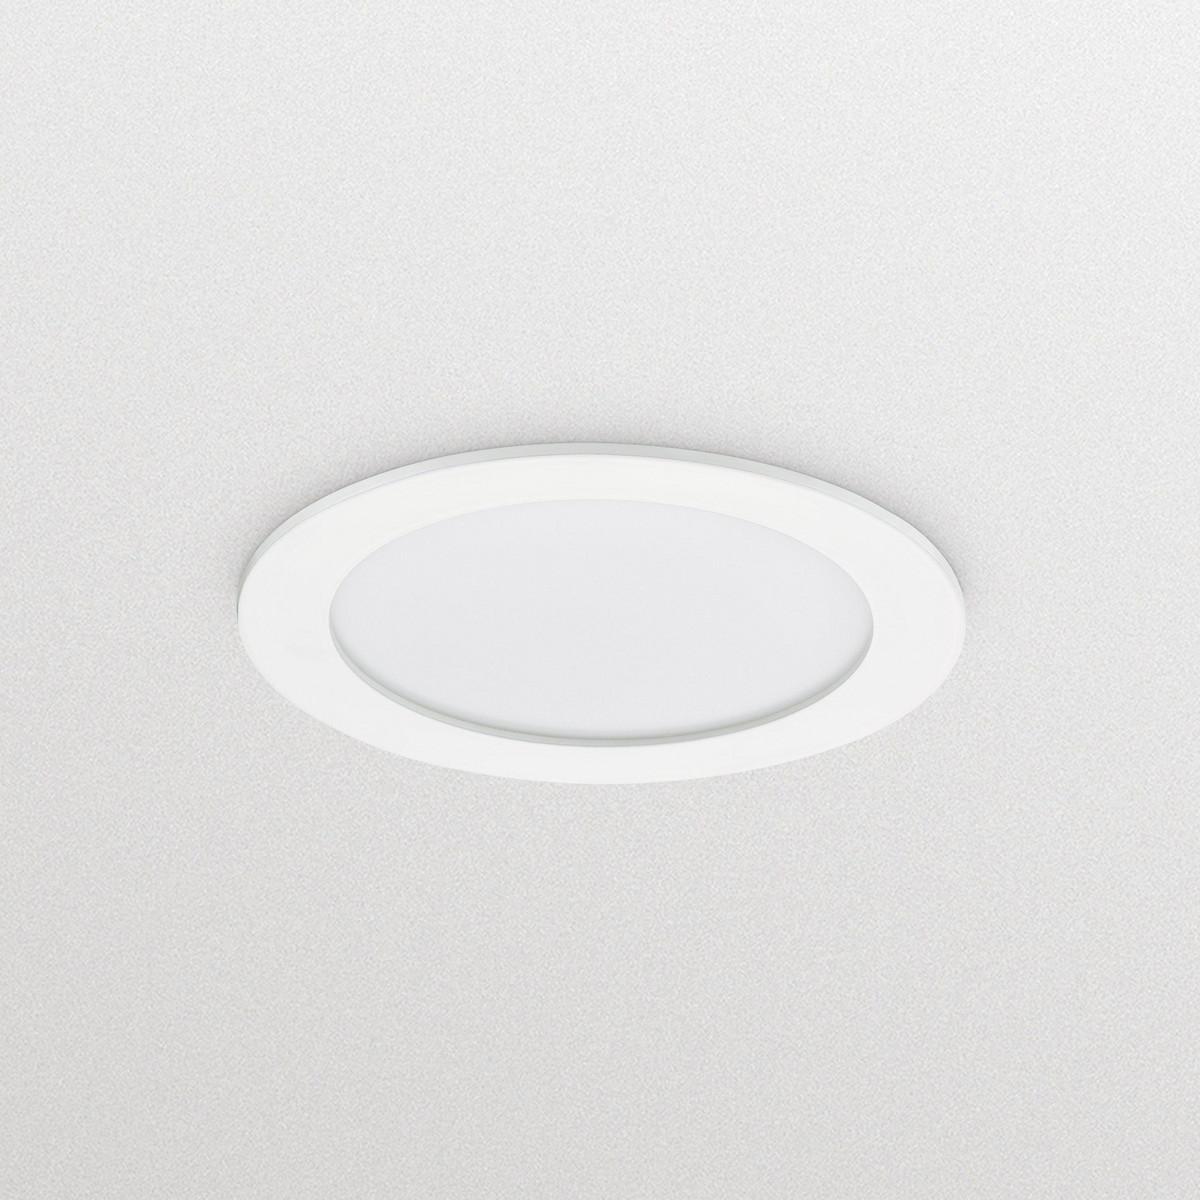 Philips CoreLine SlimDownlight DN145B LED 1100lm/840 DALI Hvid